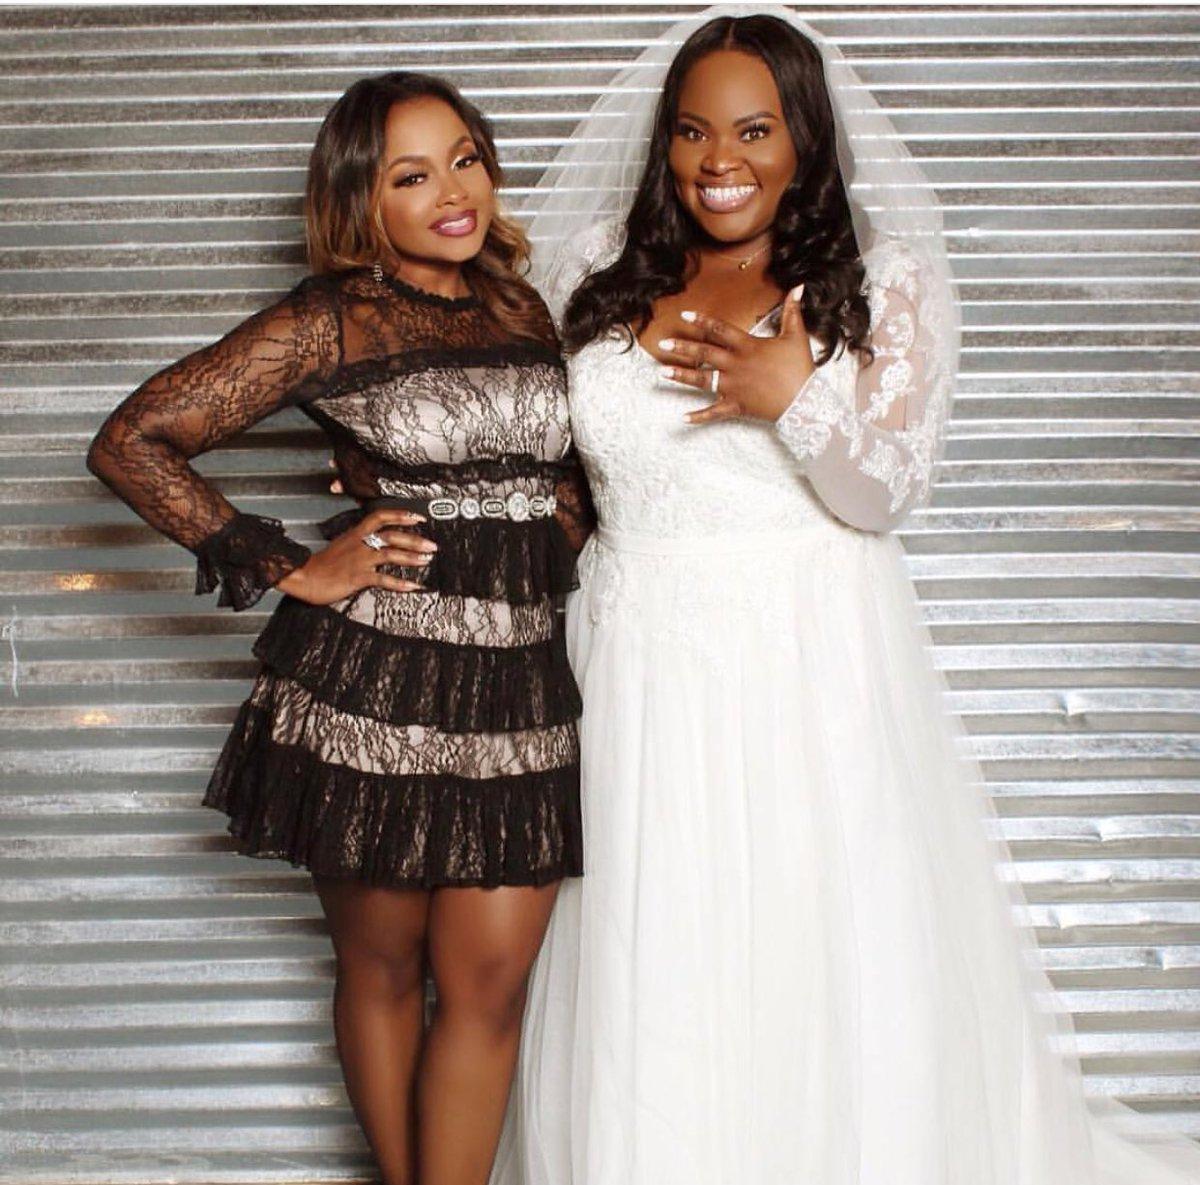 "Tasha Cobbs Surprise Wedding Photos: TV One On Twitter: "".@PhaedraParks At @tashacobbs Wedding"